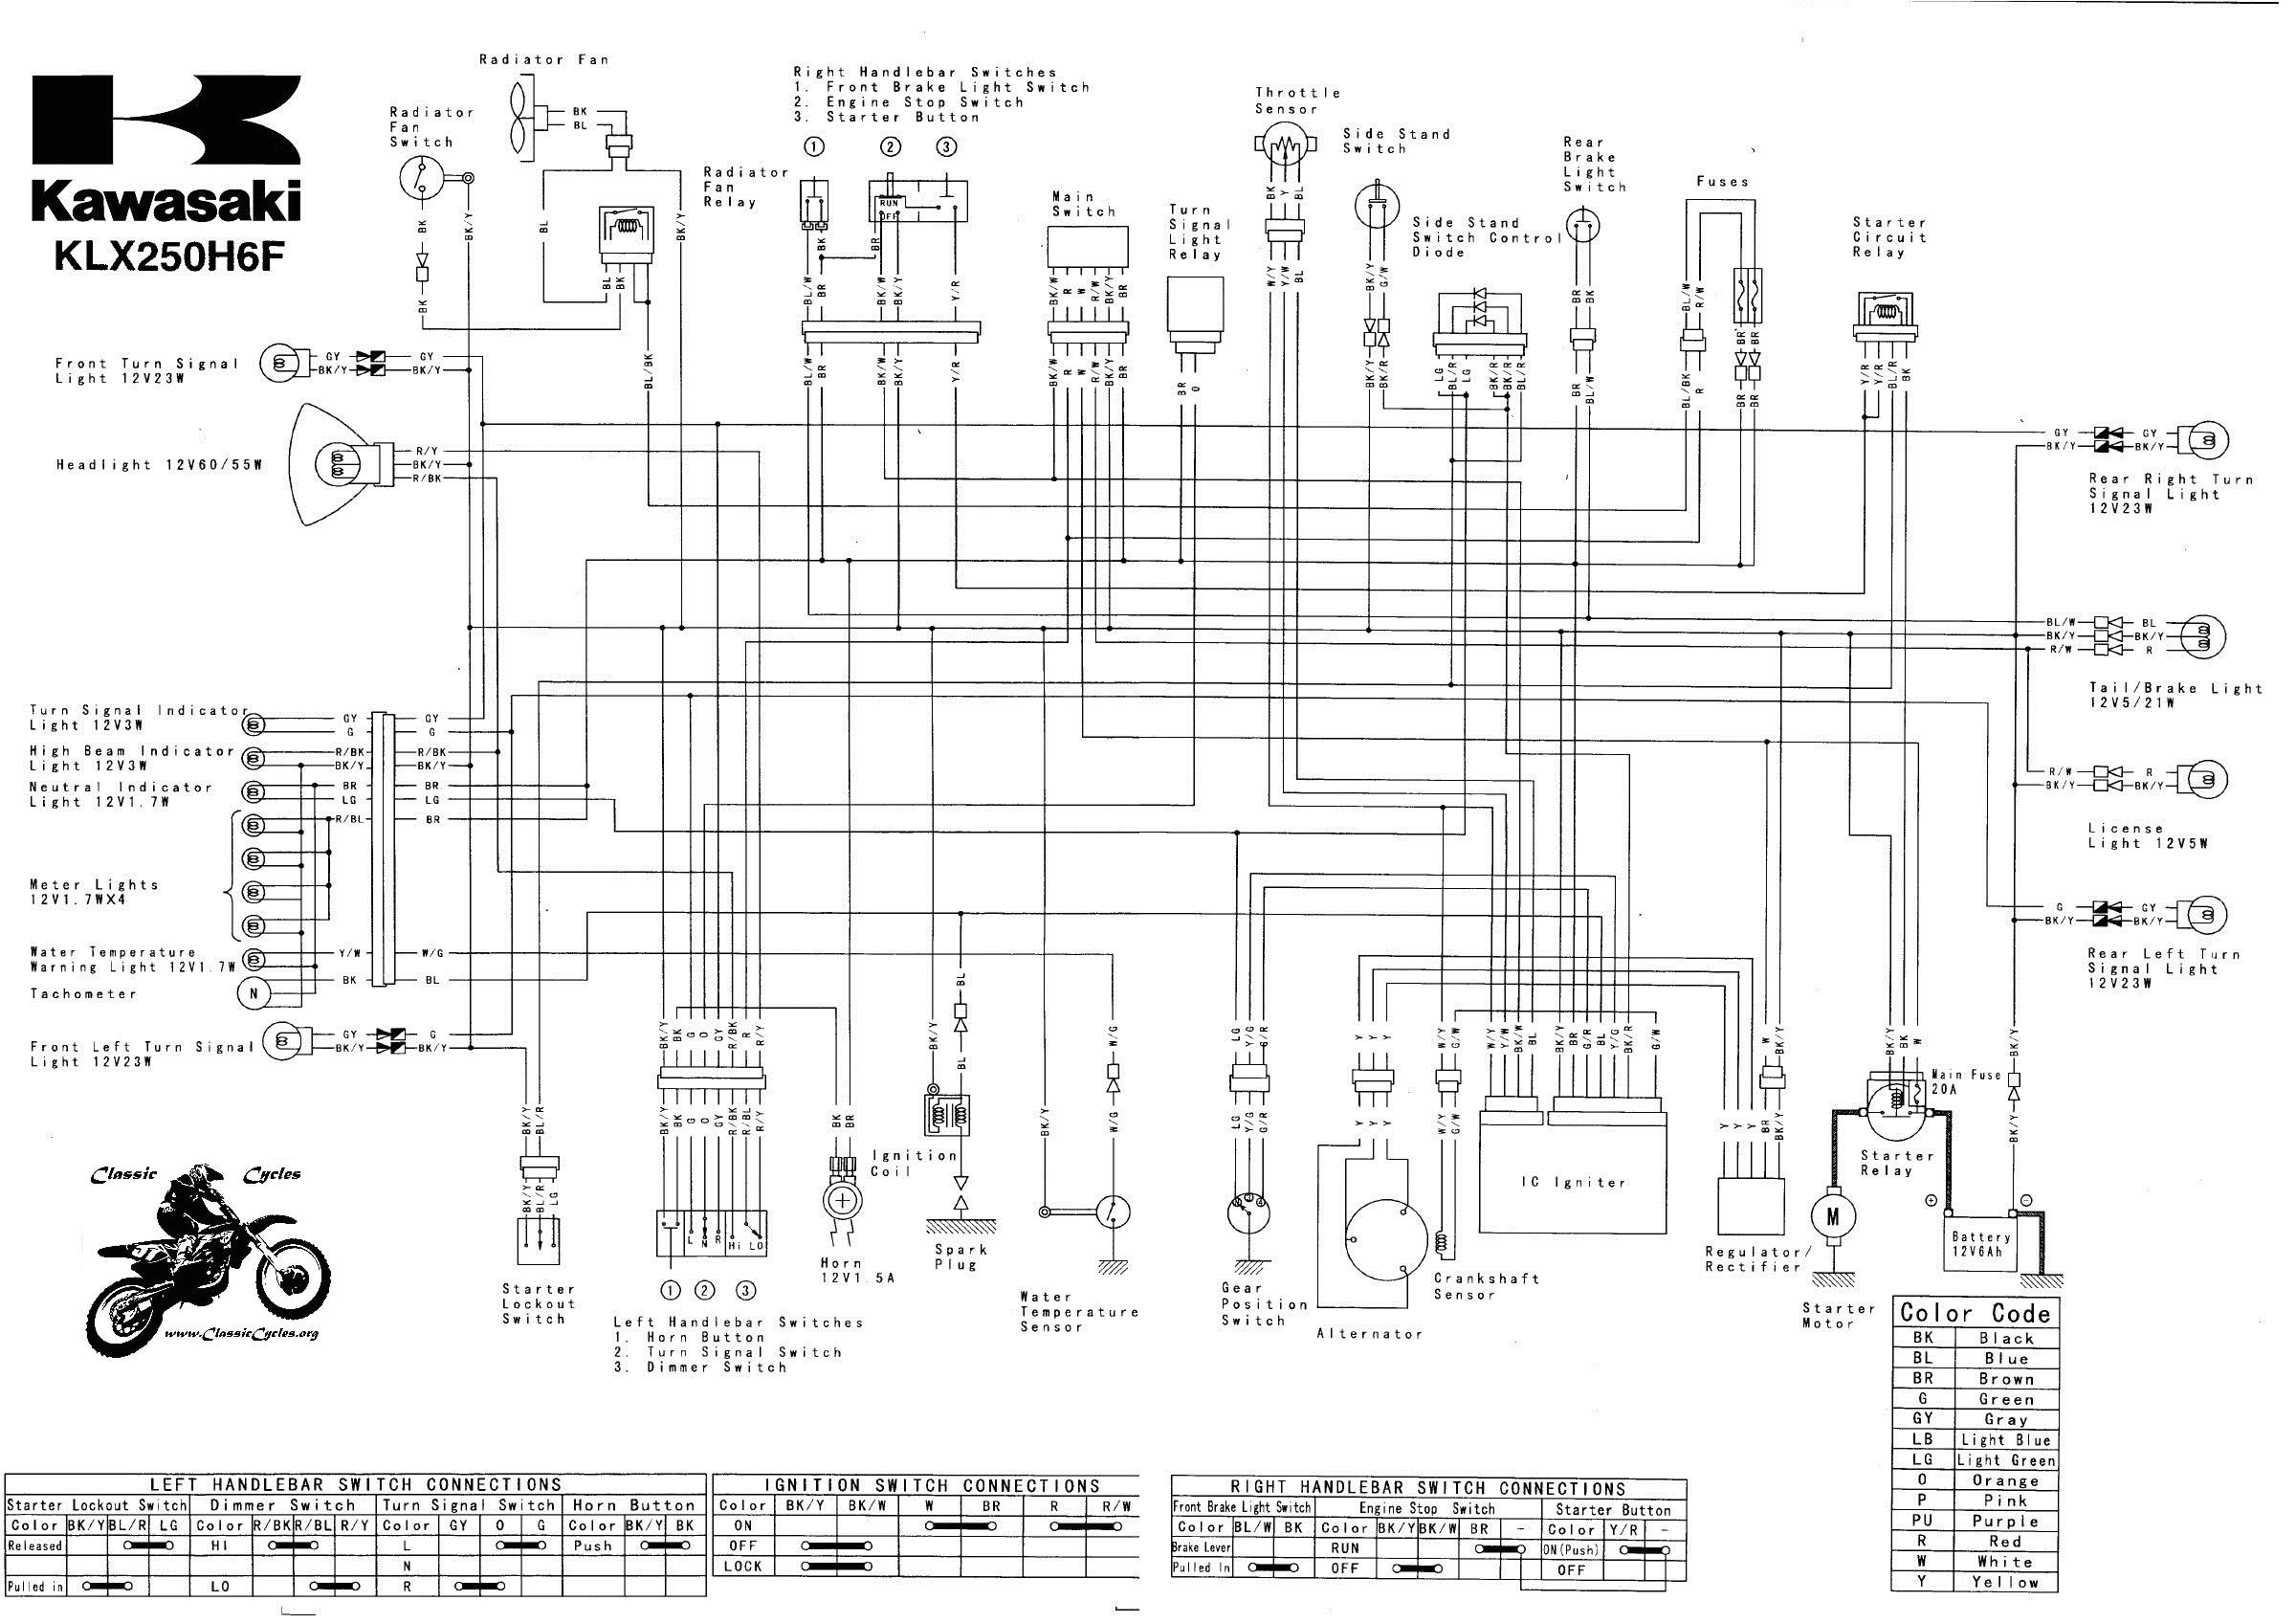 wiring harness diagram for 2006 kawasaki zx10r wiring diagram post wiring harness diagram for 2006 kawasaki zx10r